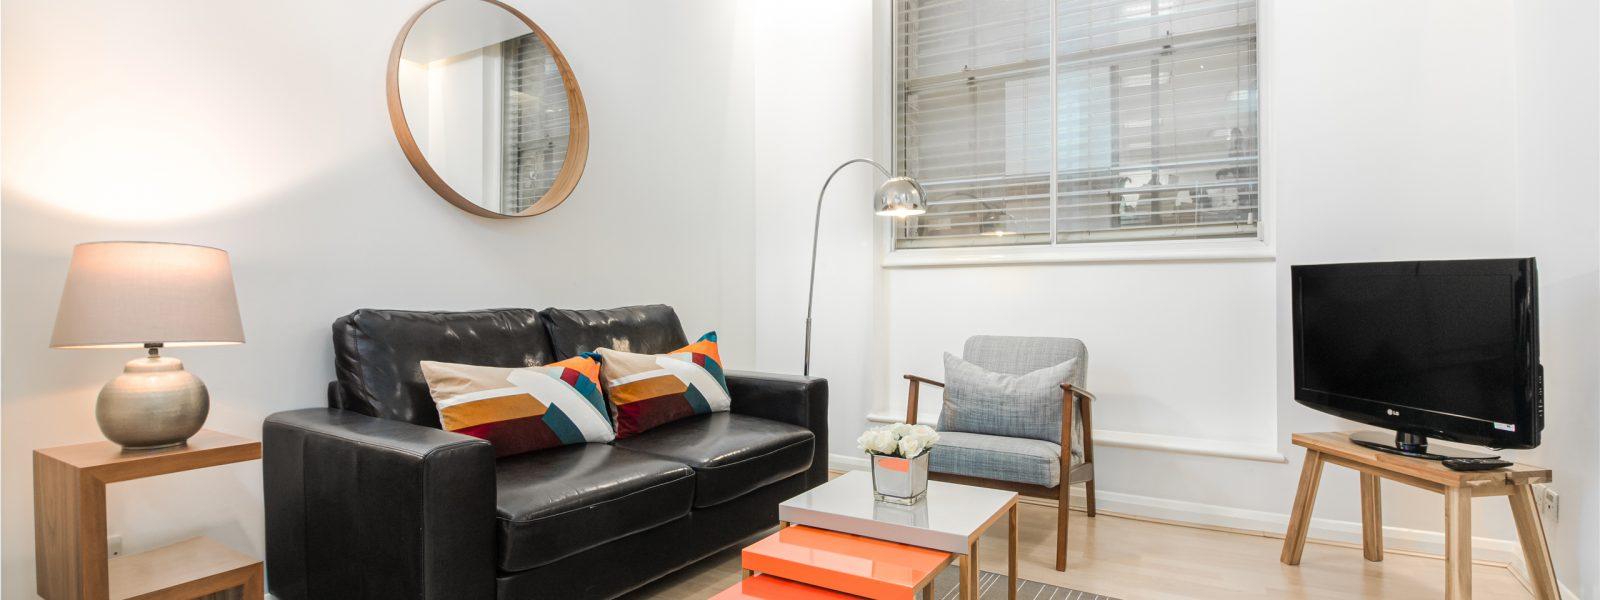 St Pauls – 1 Bedroom Serviced Apartment – Standard